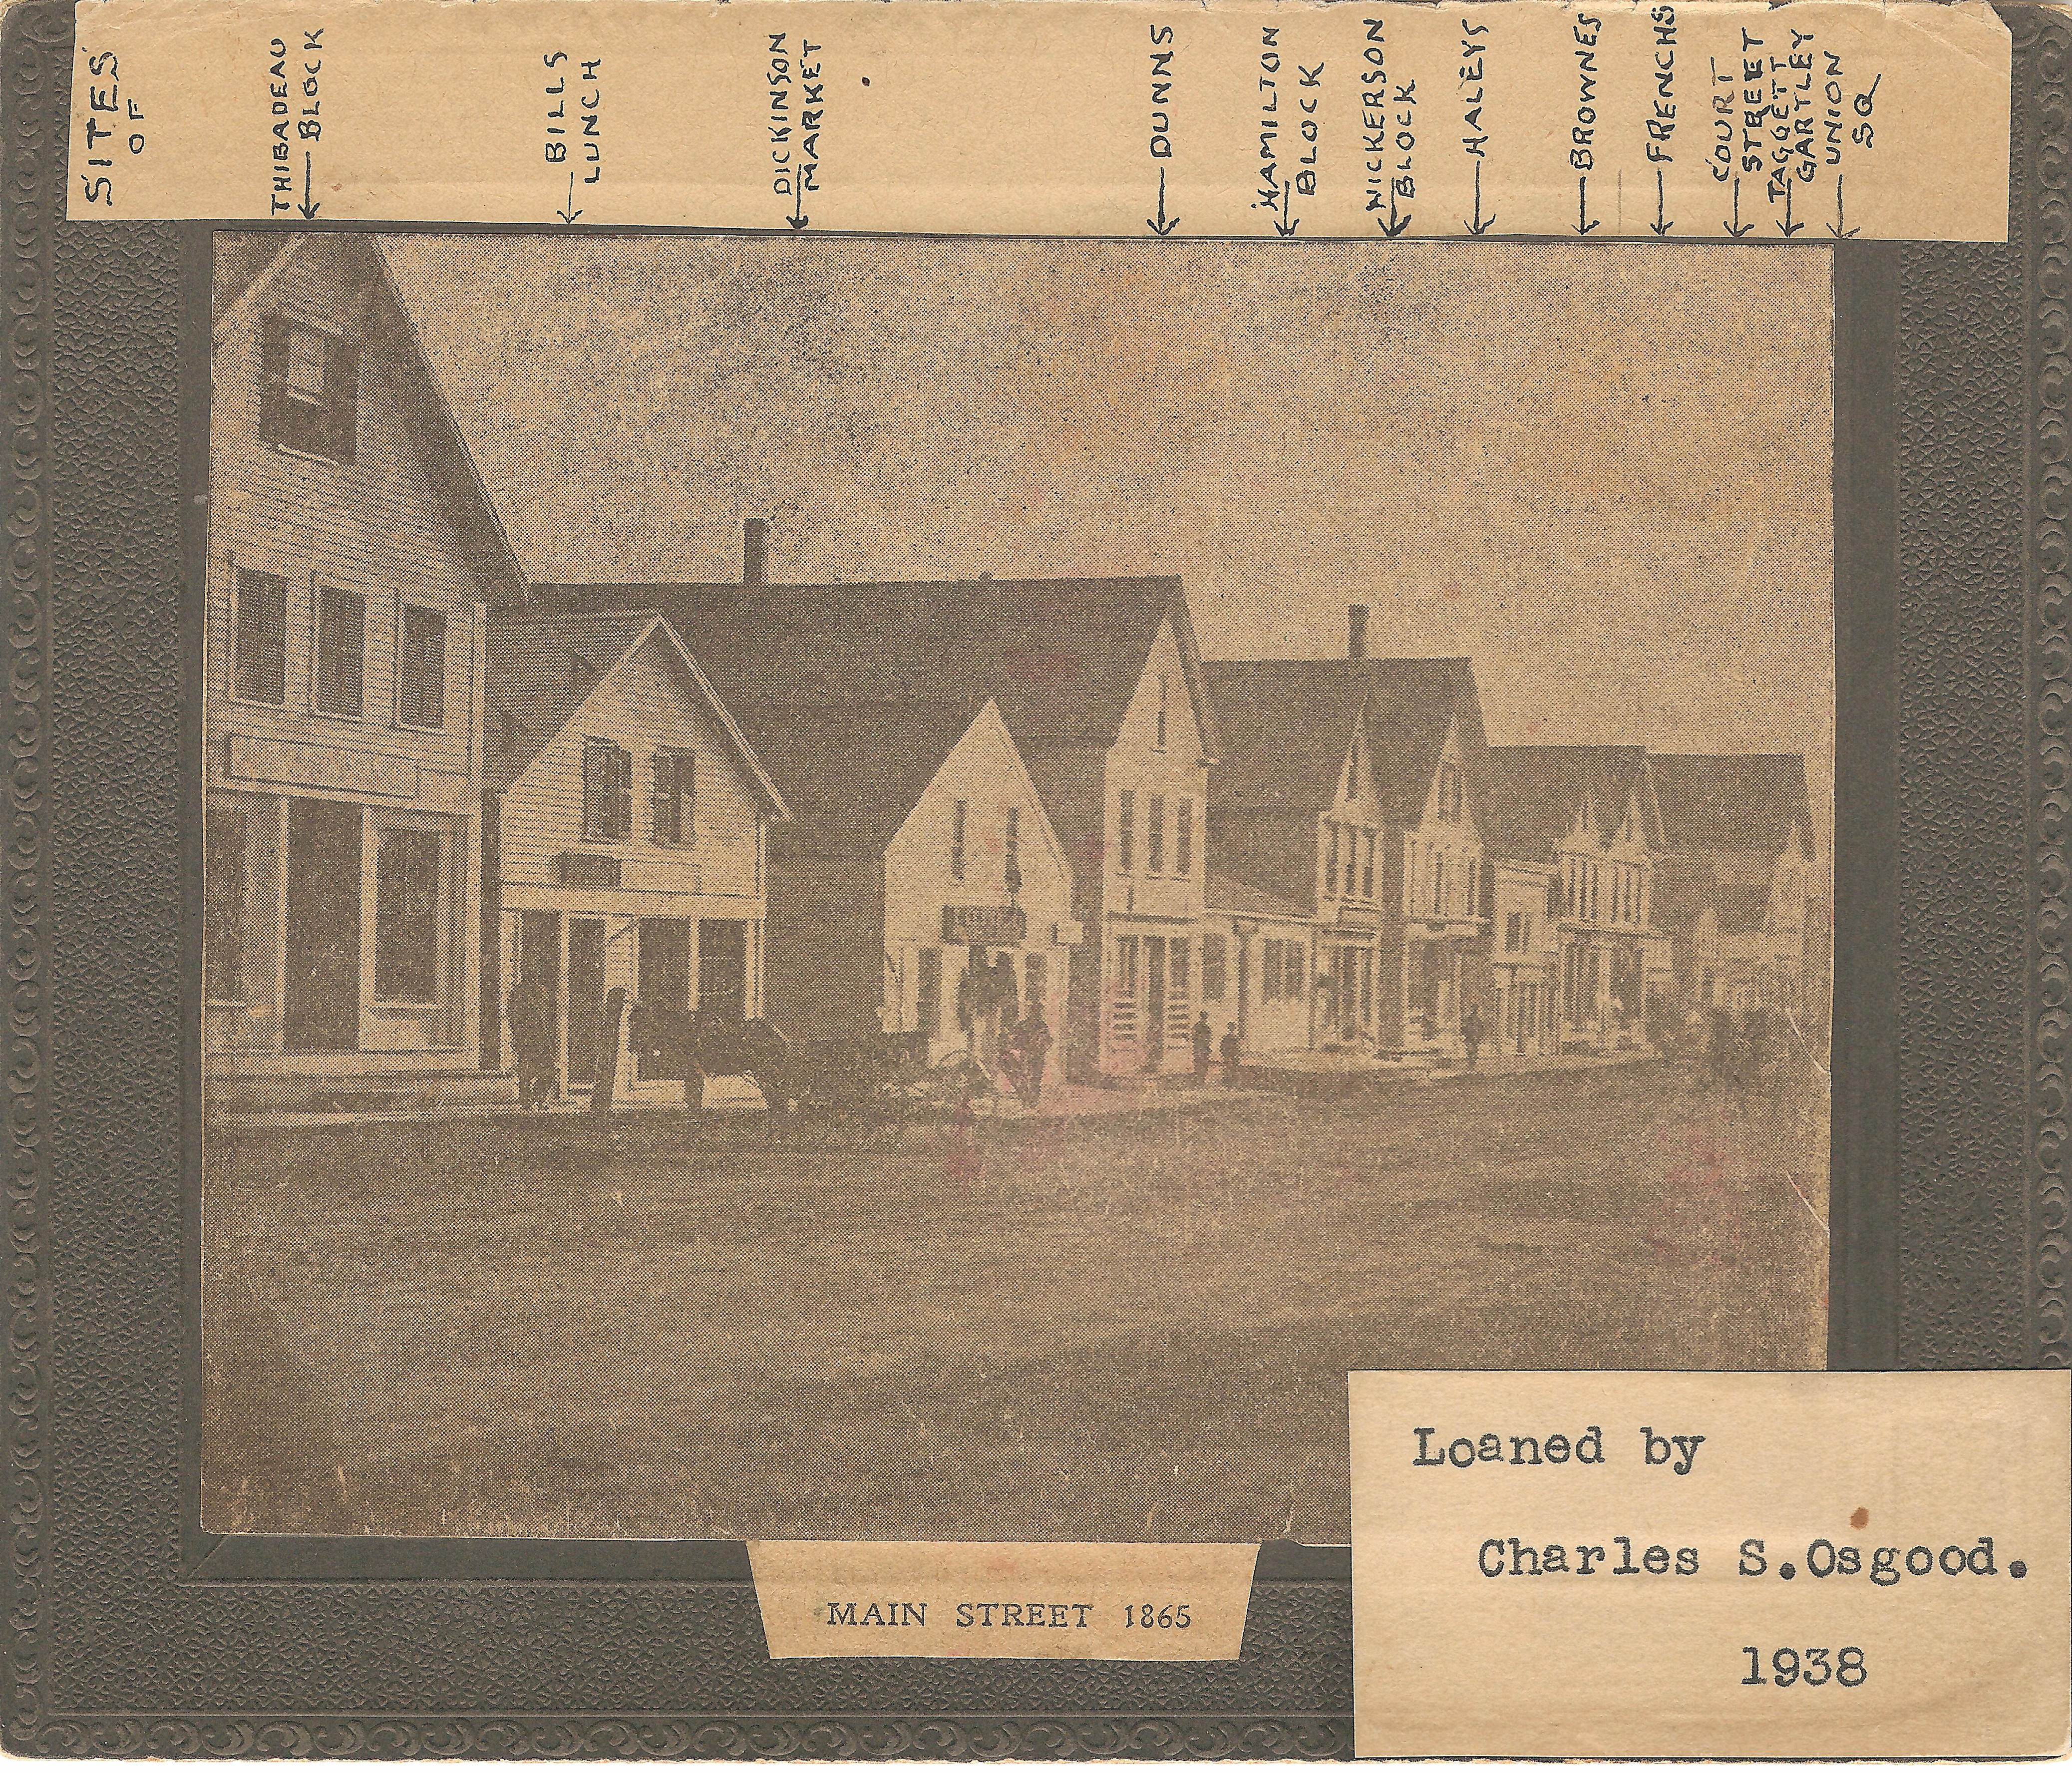 Main Street 1865 Osgood Collection